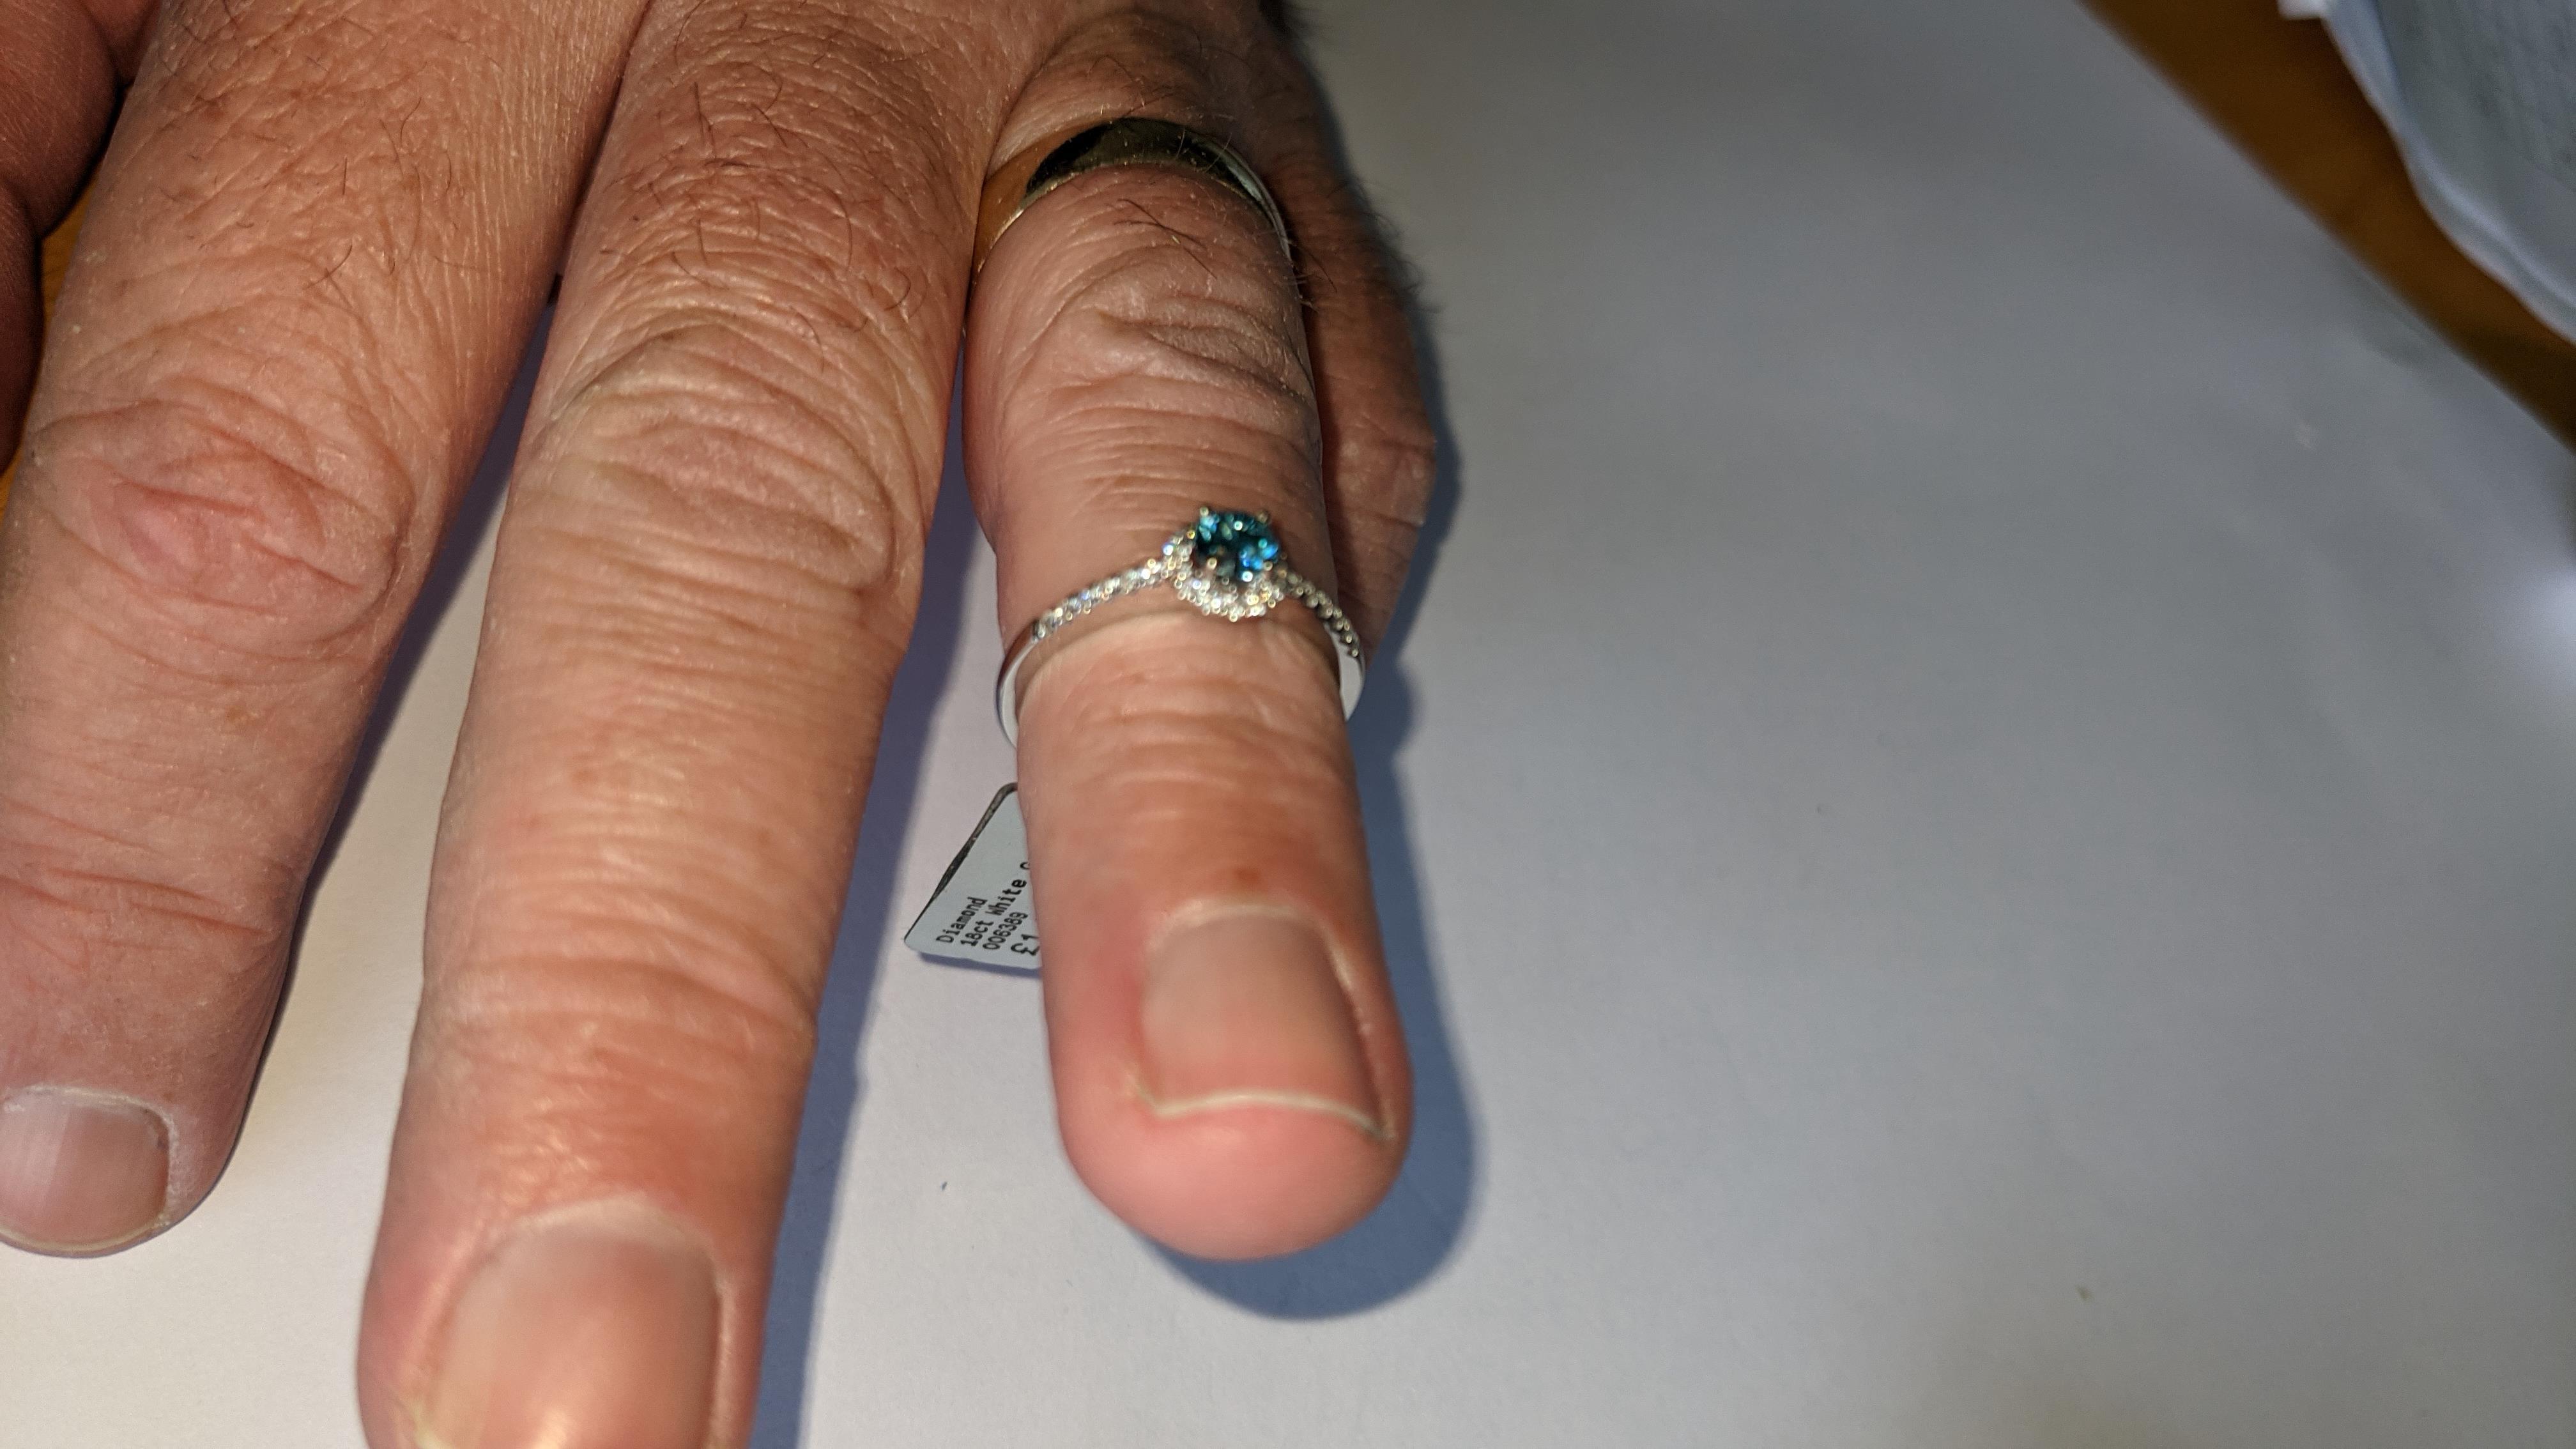 18ct white gold & diamond ring with 0.30ct blue diamond & 0.1ct of additional diamonds around the ce - Image 19 of 19